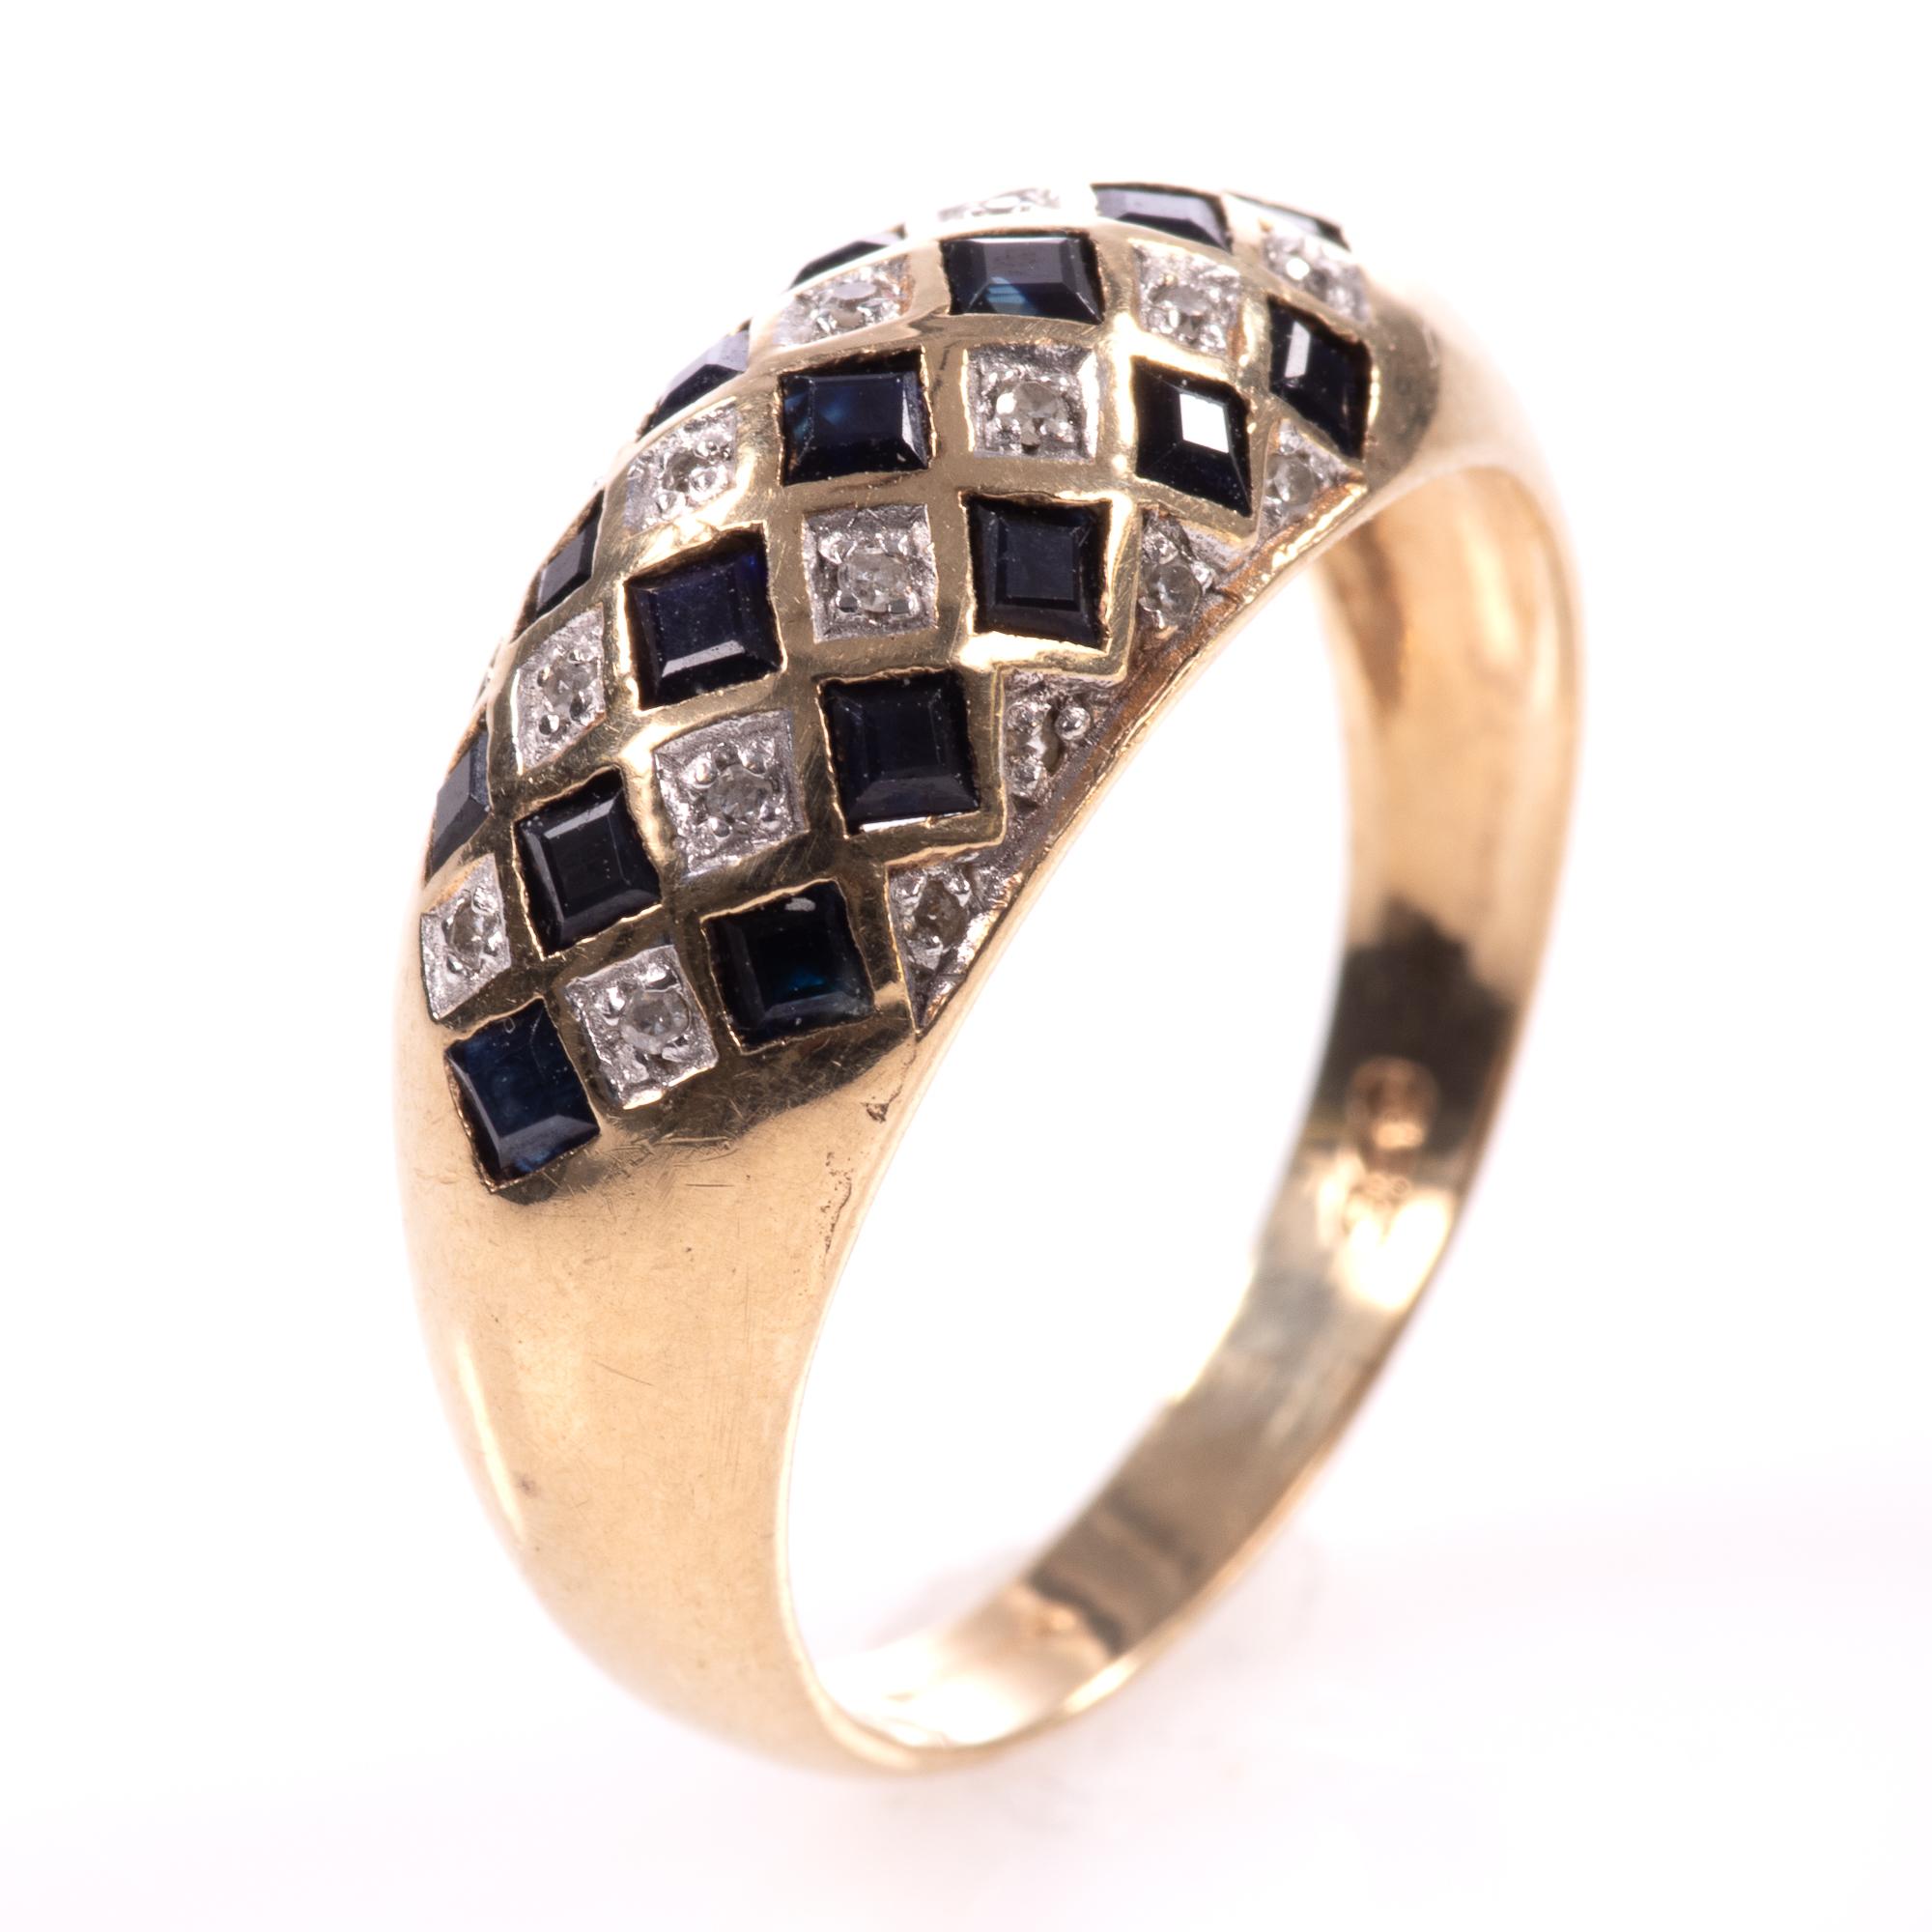 9ct Gold Art Deco Style 0.68ct Sapphire & Diamond Ring